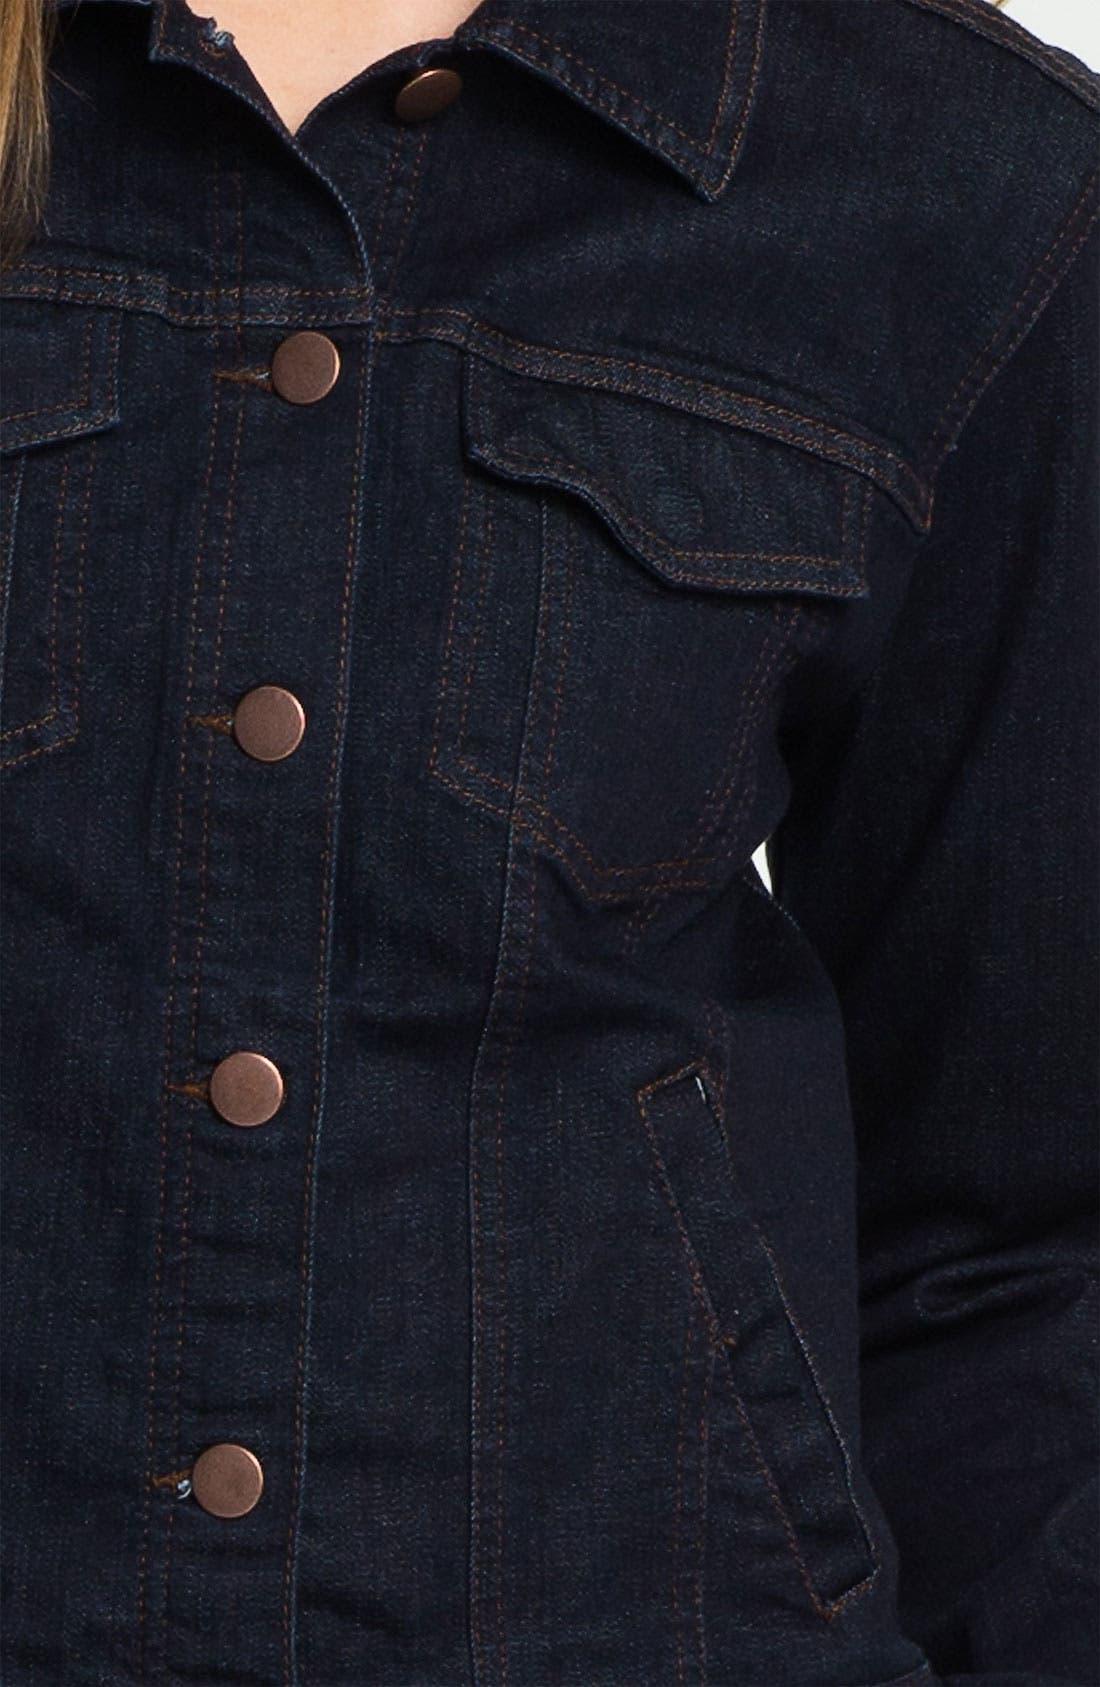 Organic Cotton Blend Denim Jacket,                             Alternate thumbnail 5, color,                             402